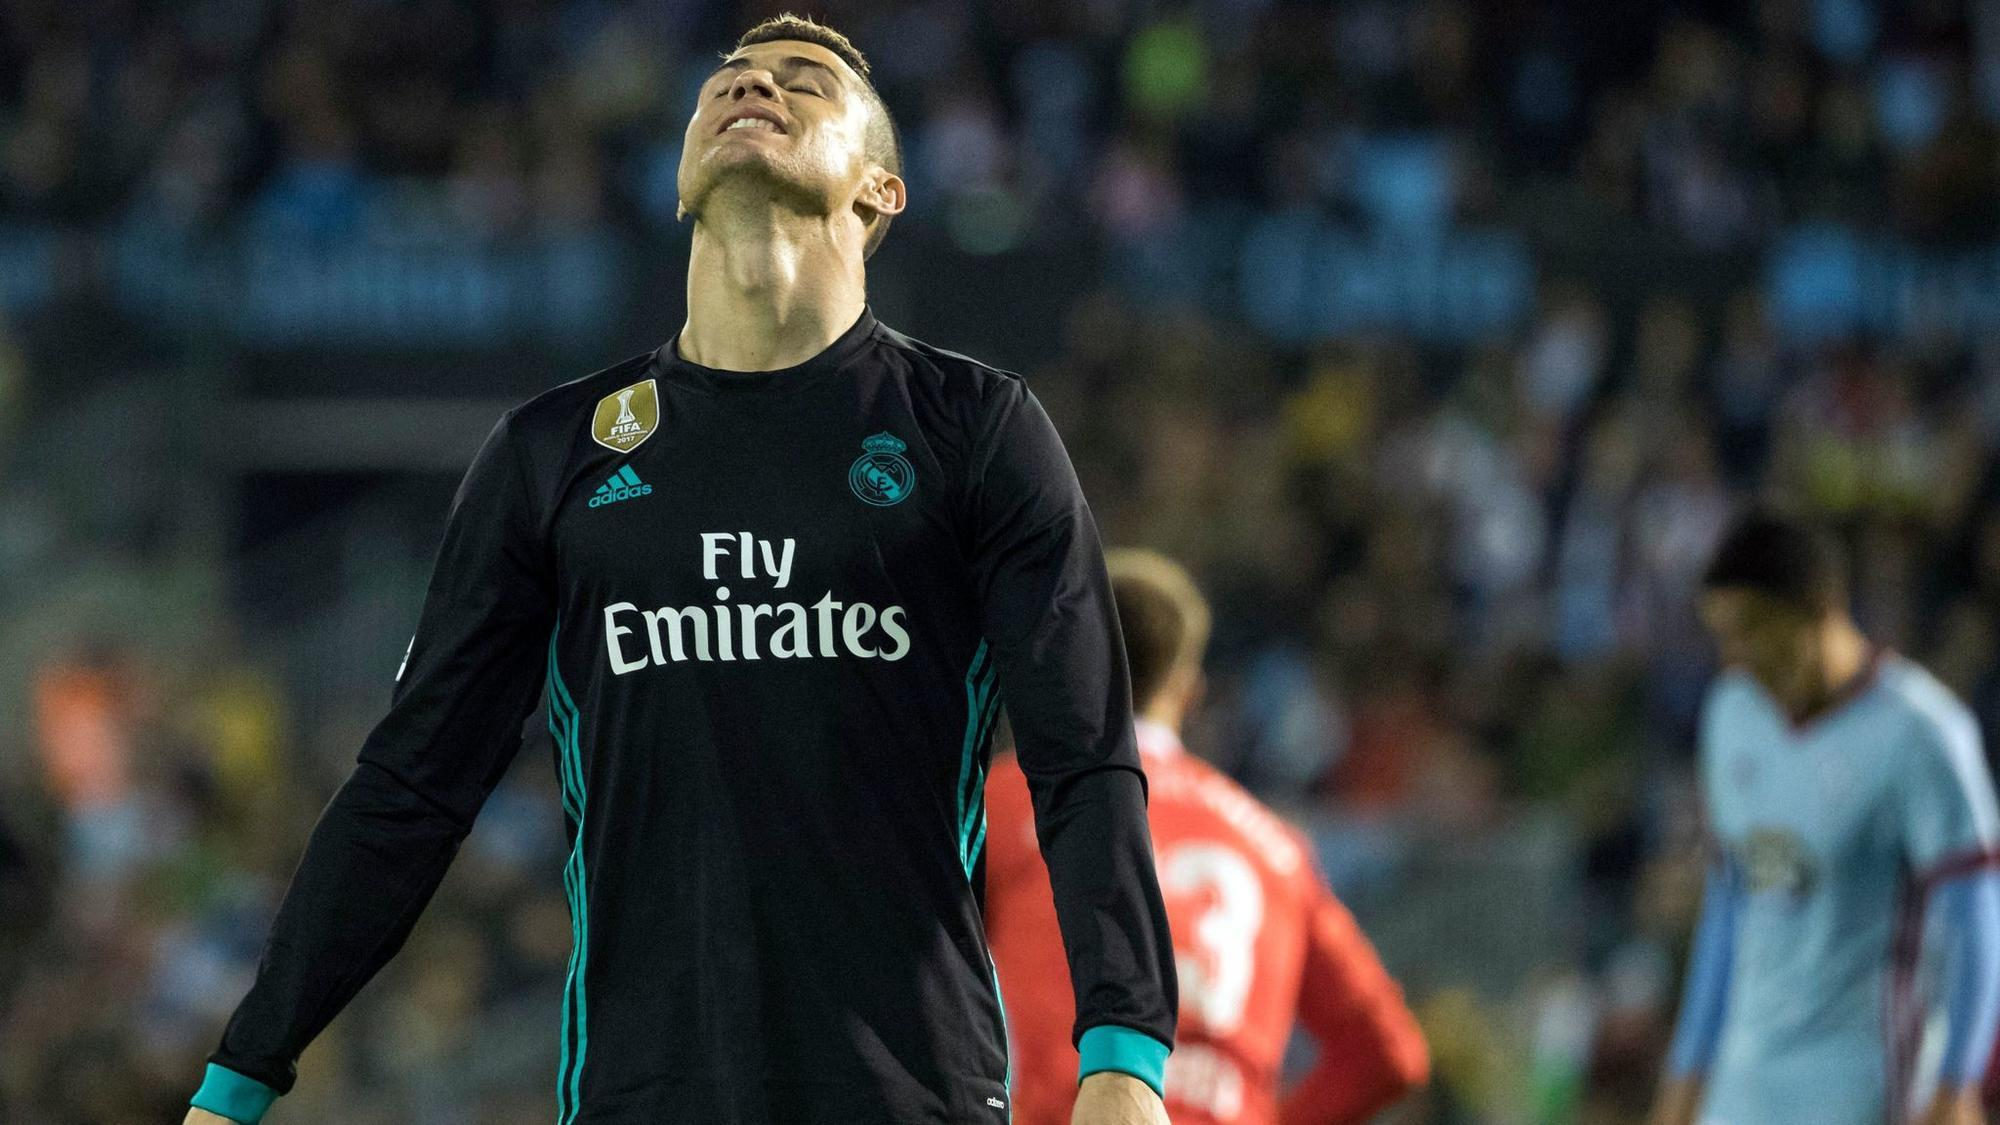 El Real Madrid Se Aleja De La Pelea Por La Liga Hoy Chicago